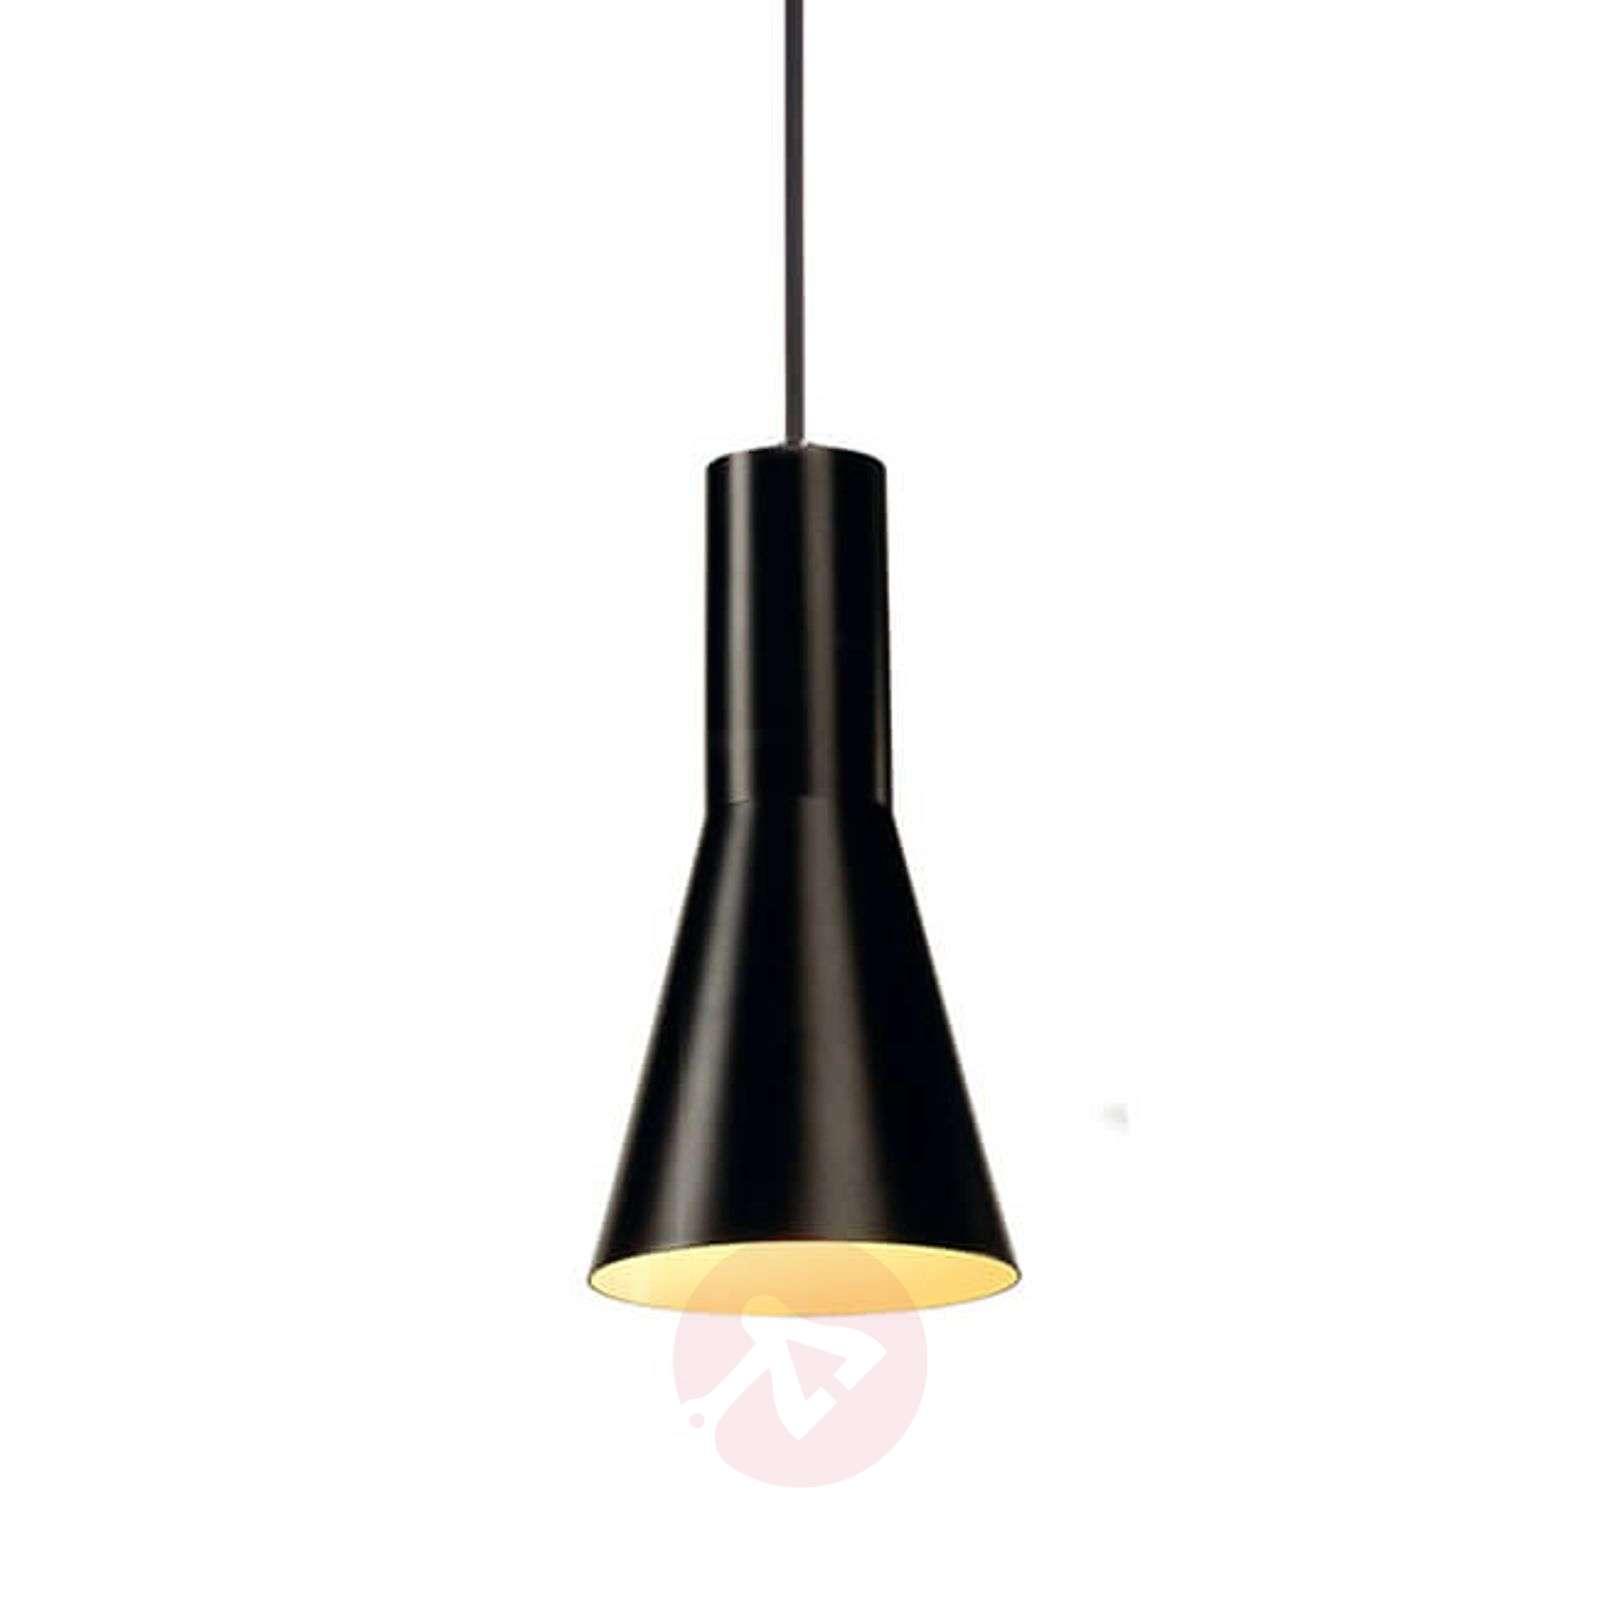 Small pendant light Phelia-5504738-01